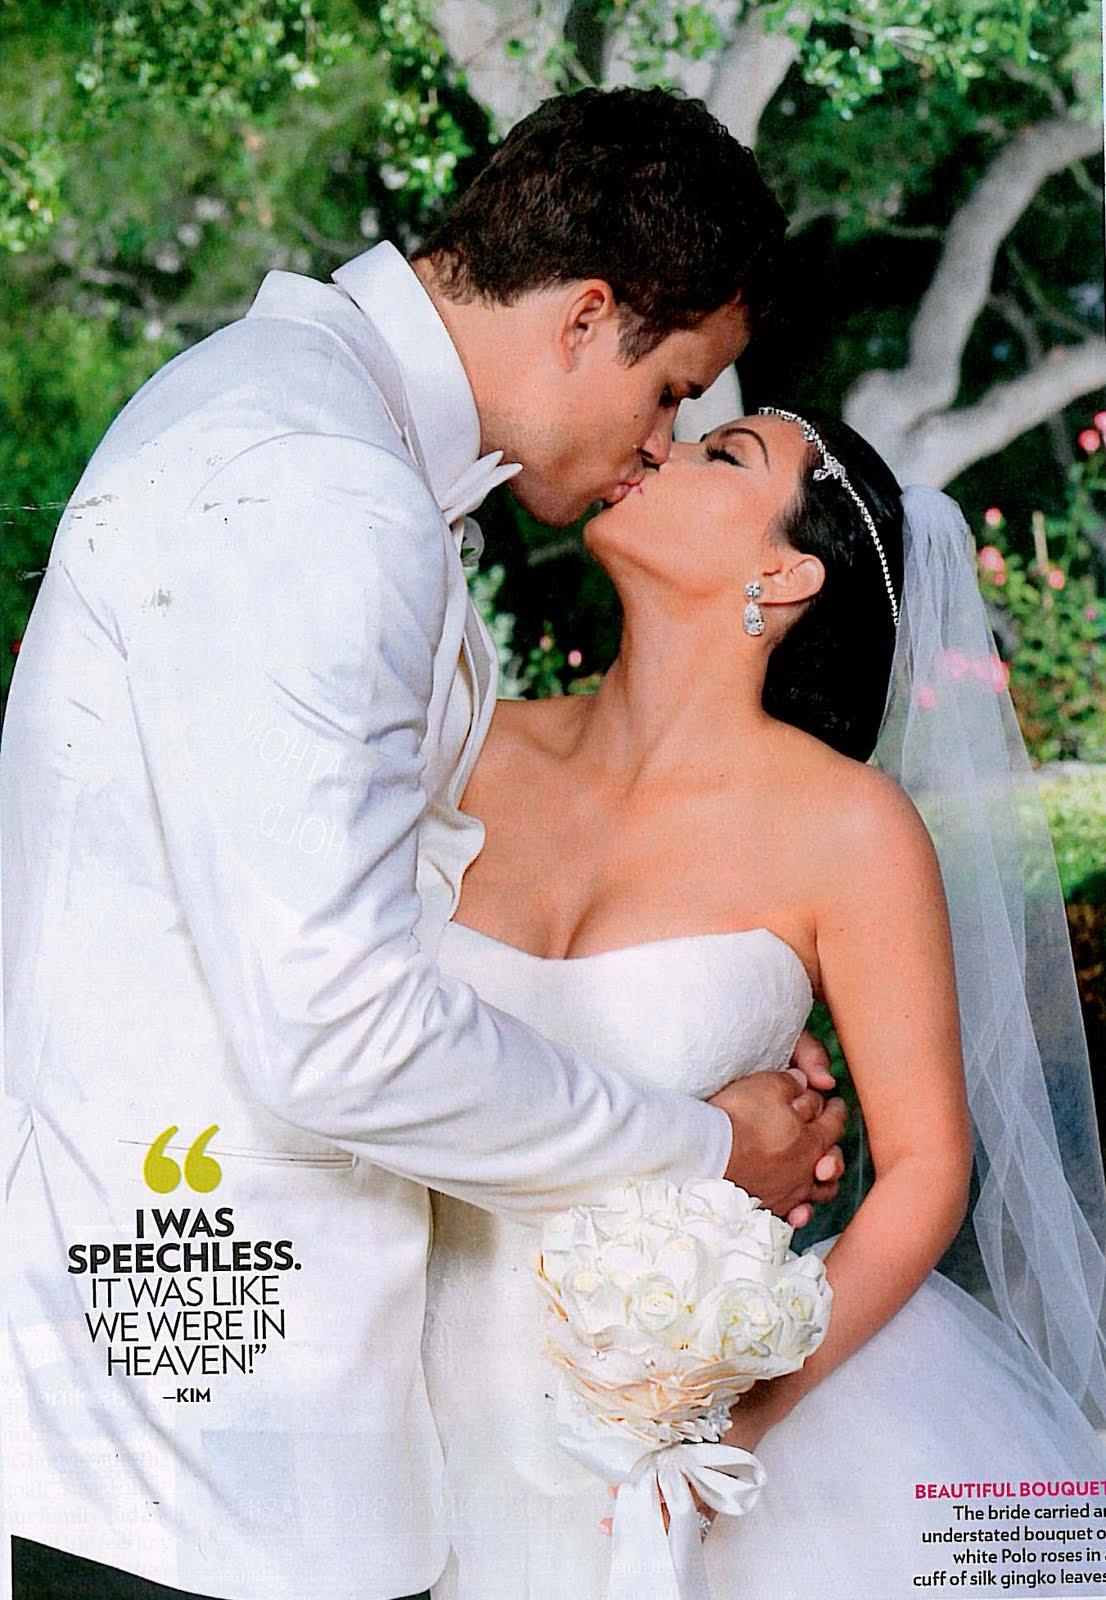 http://4.bp.blogspot.com/-o-eNutqfx9k/TsAr9Z18oyI/AAAAAAAAGGs/lxPoXMh3OKg/s1600/Kim_Humphries_Wedding.jpg